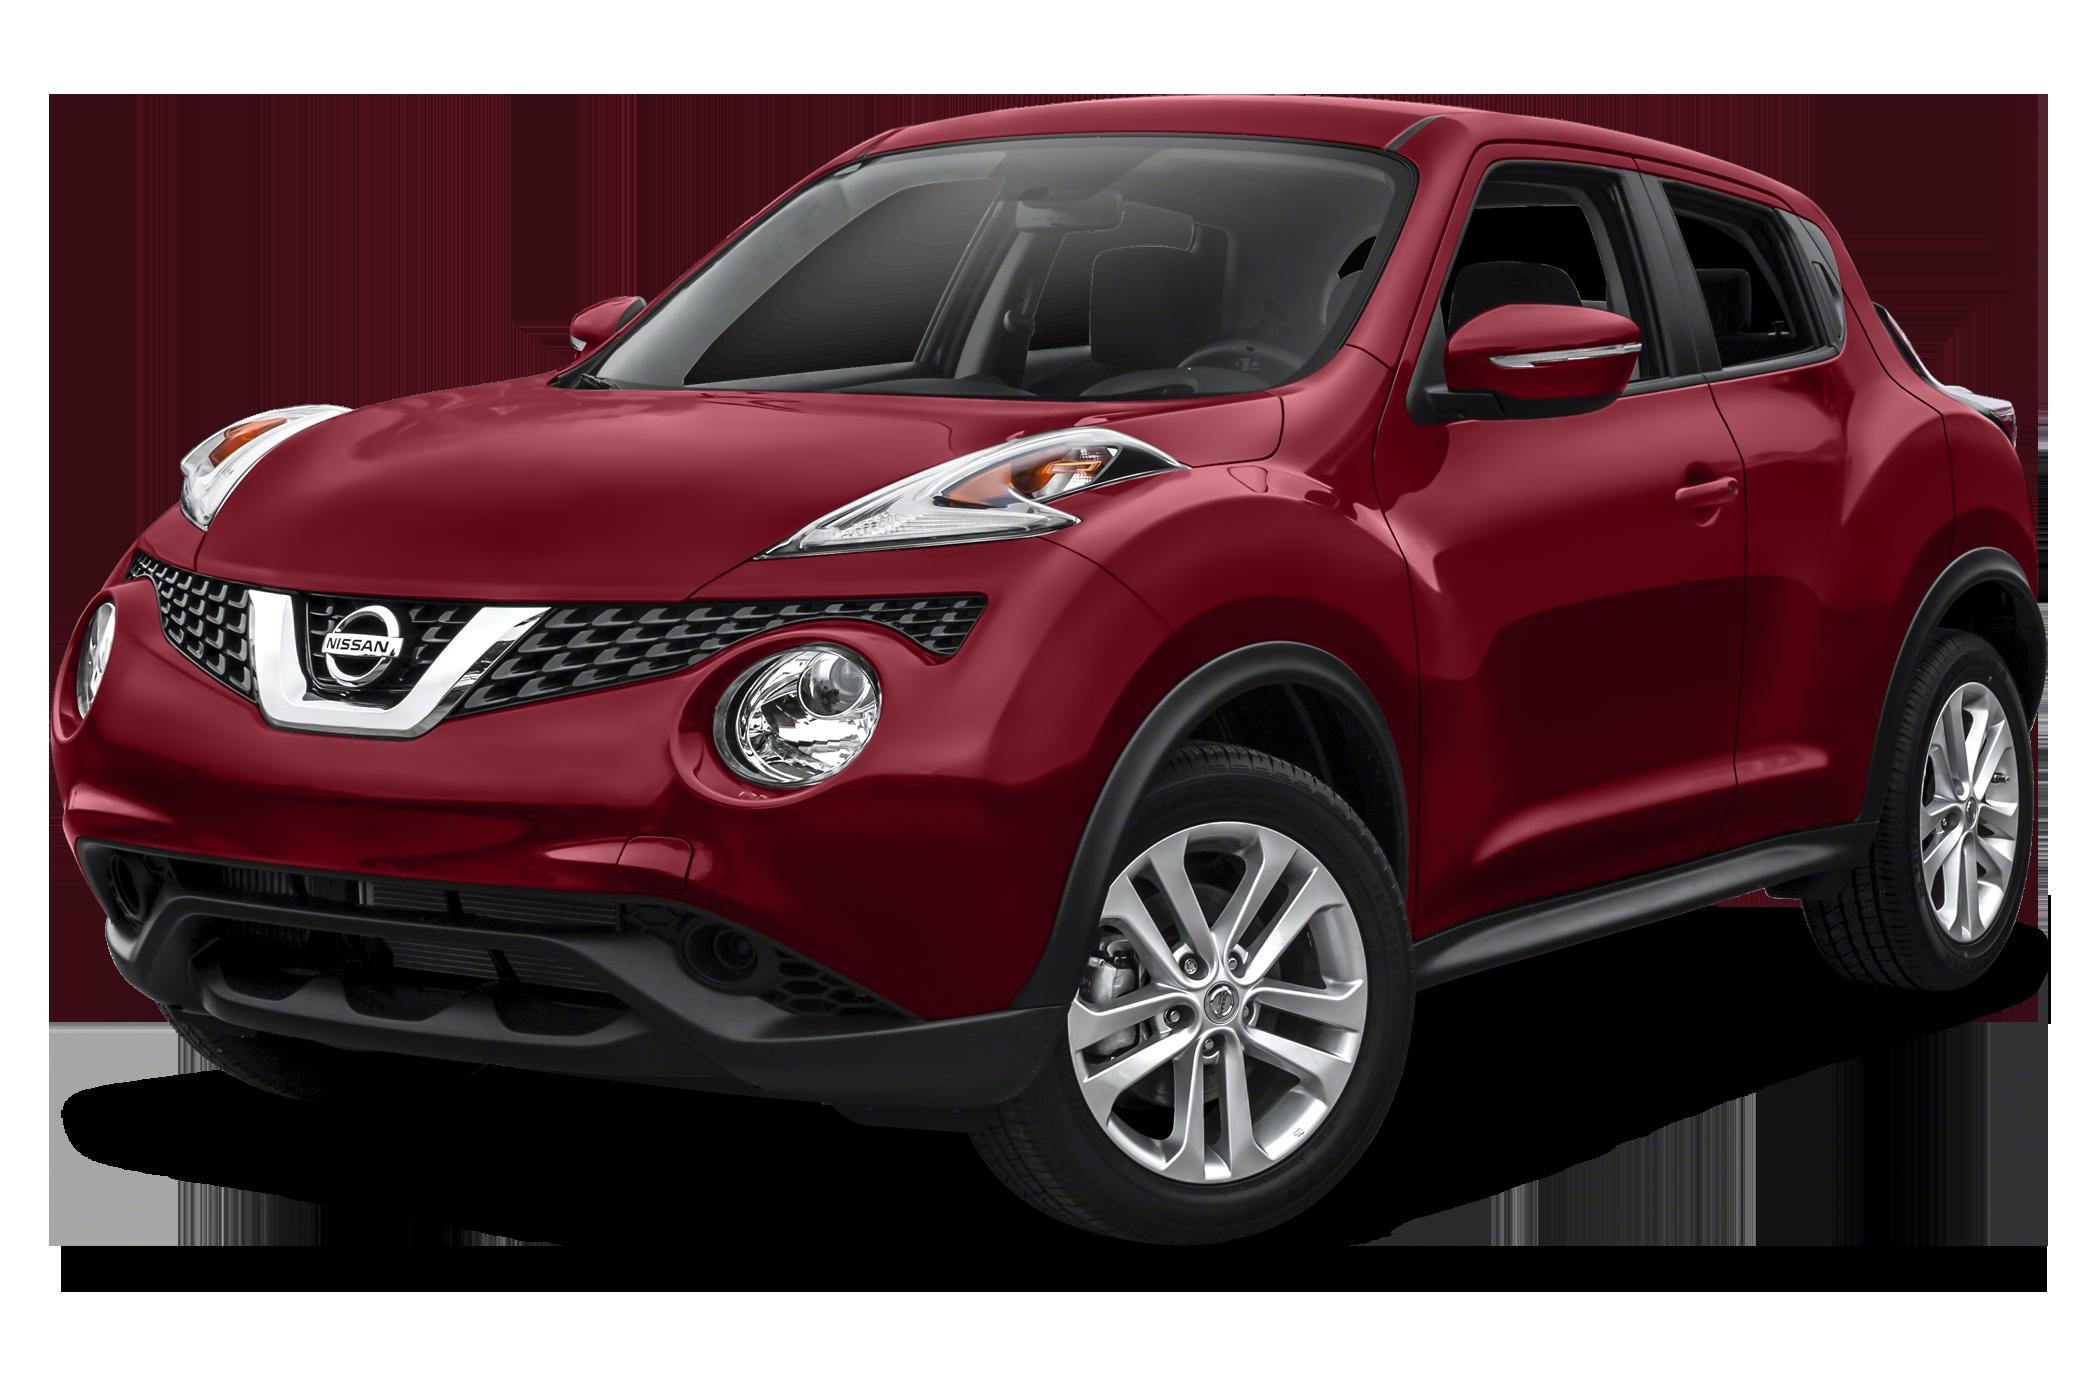 Compare Nissan/Juke to Nissan/Rogue